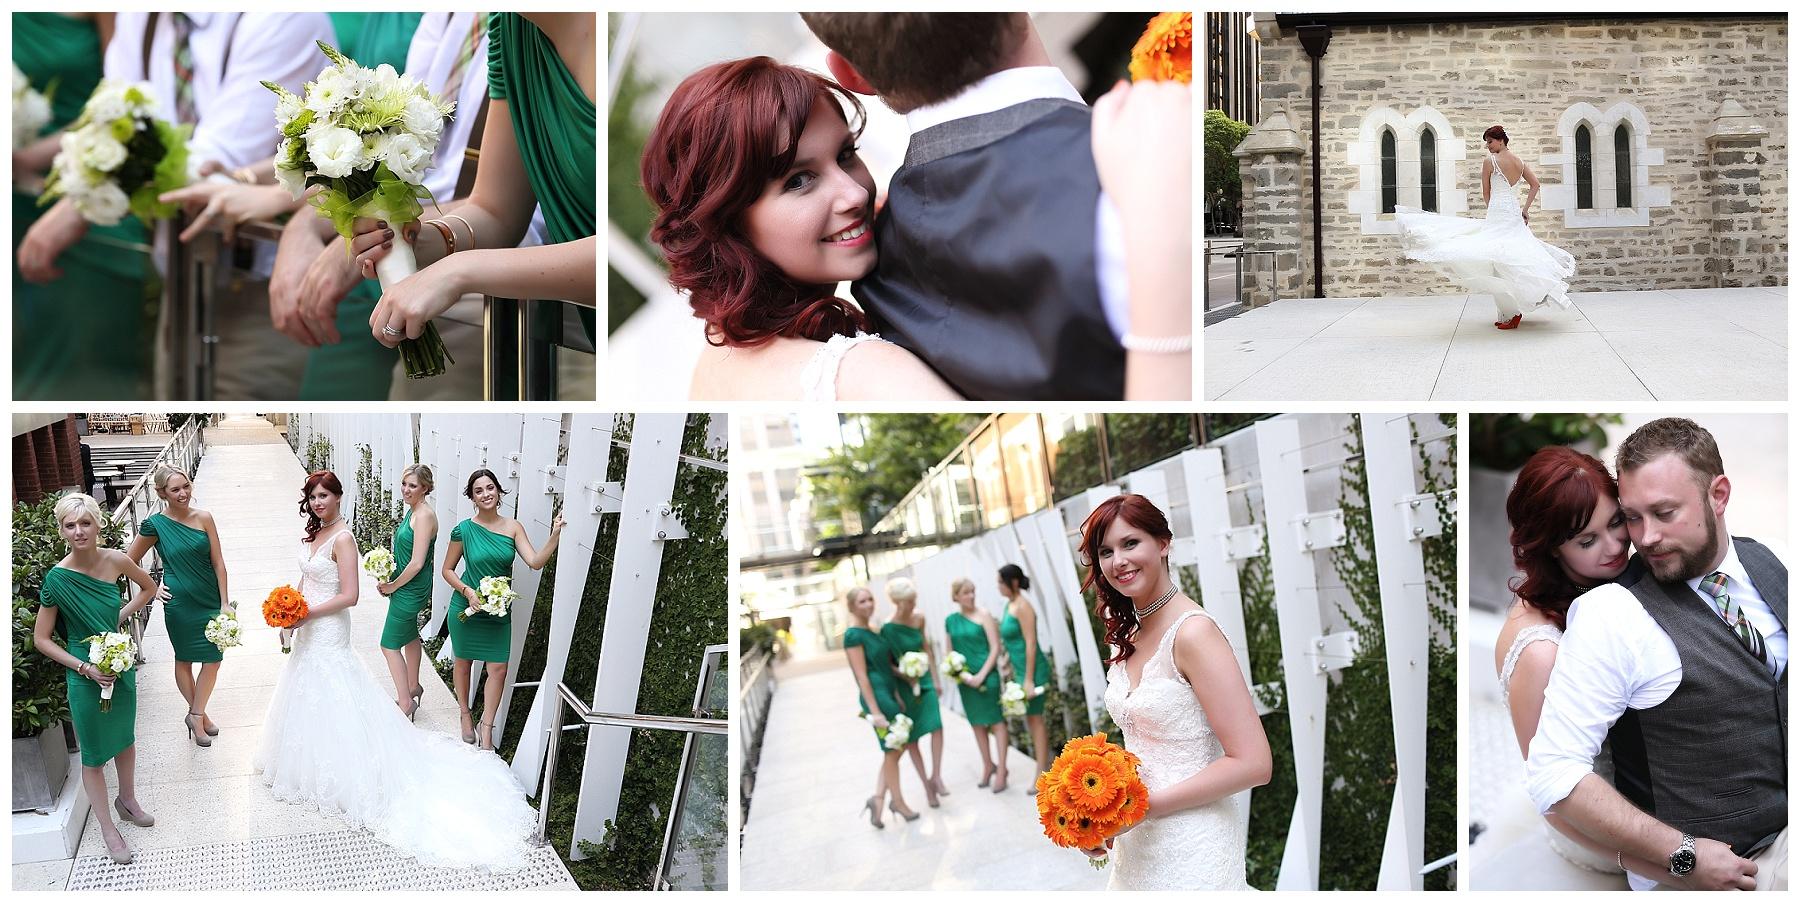 trustee wedding